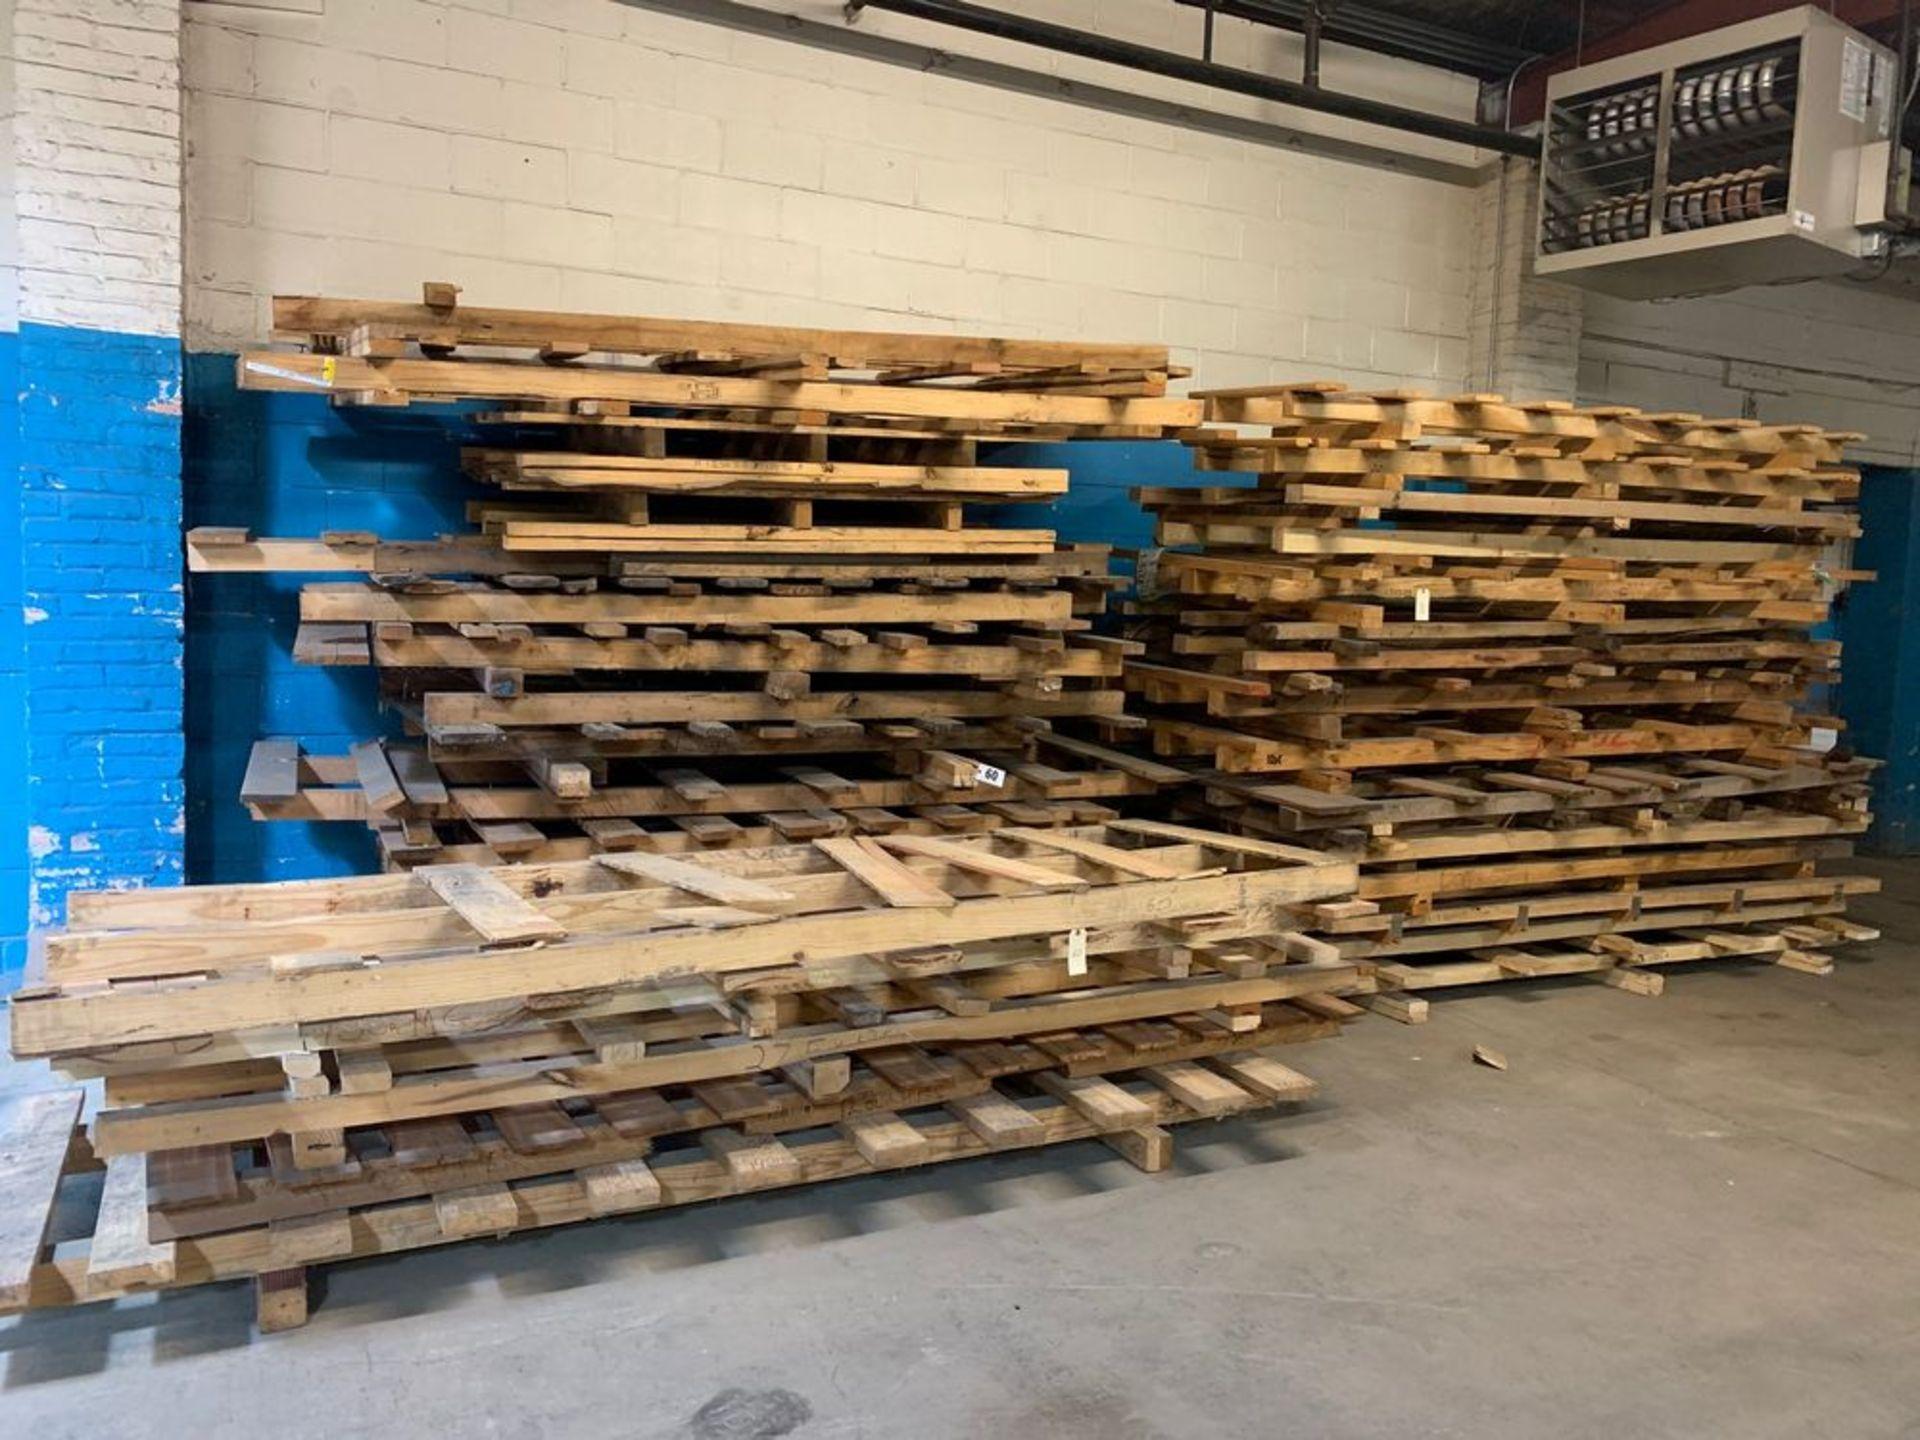 Lot 60 - Lot of Large Skids (3 stacks)